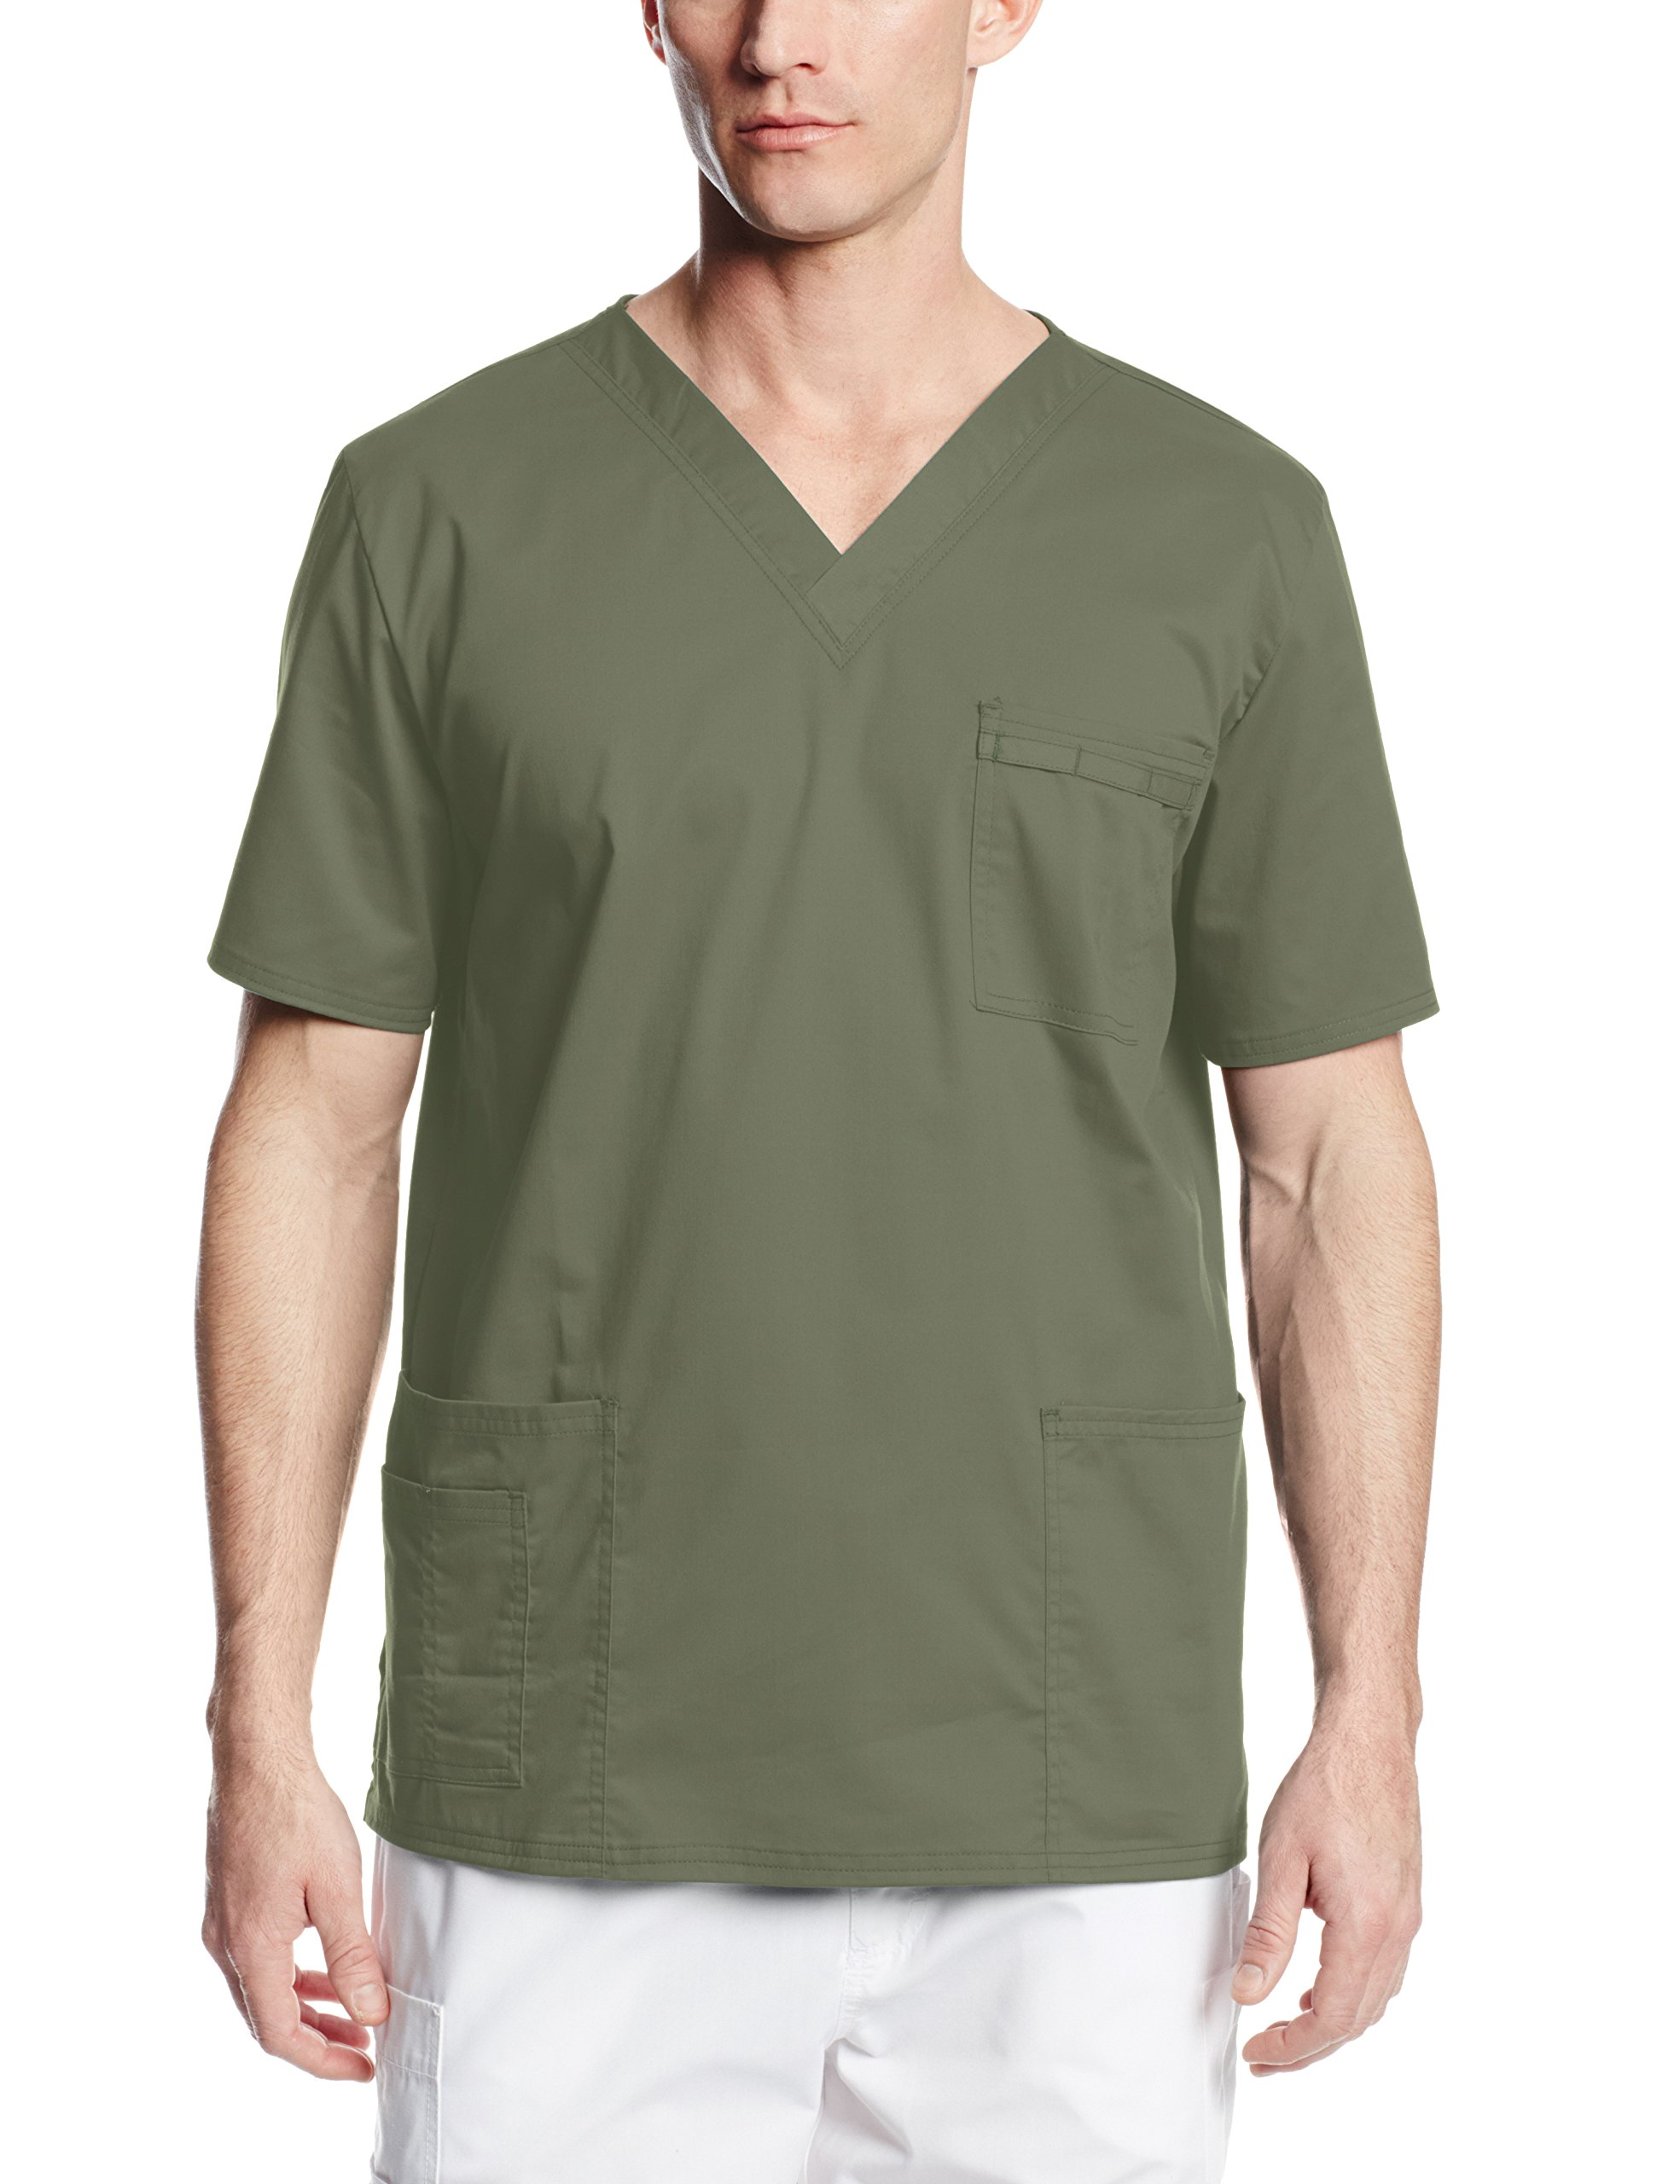 Cherokee Men's Ww Core Stretch Unisex V-Neck Scrub Top, Olive, X-Small